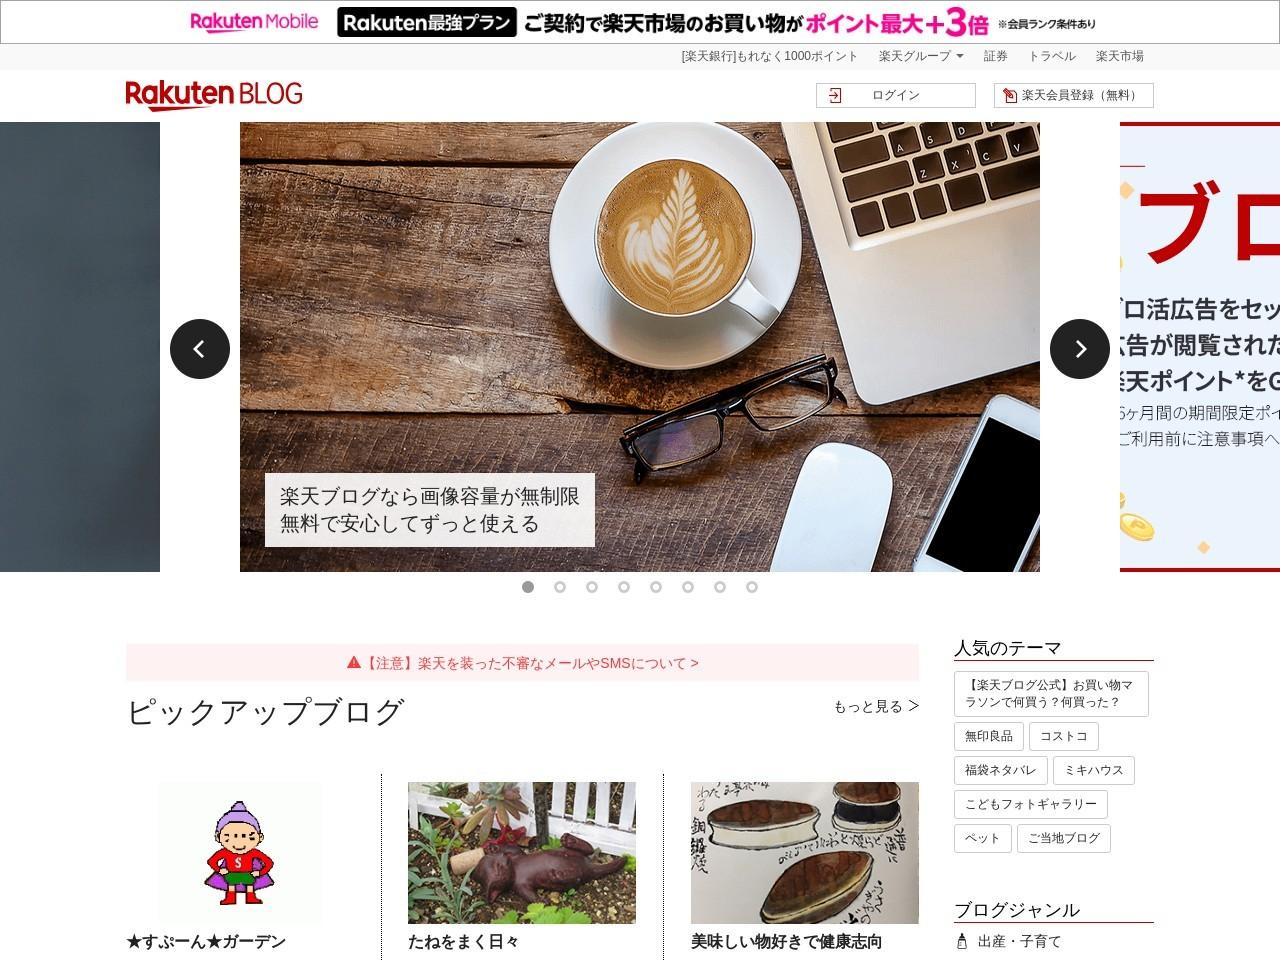 http://plaza.rakuten.co.jp/basuturi/